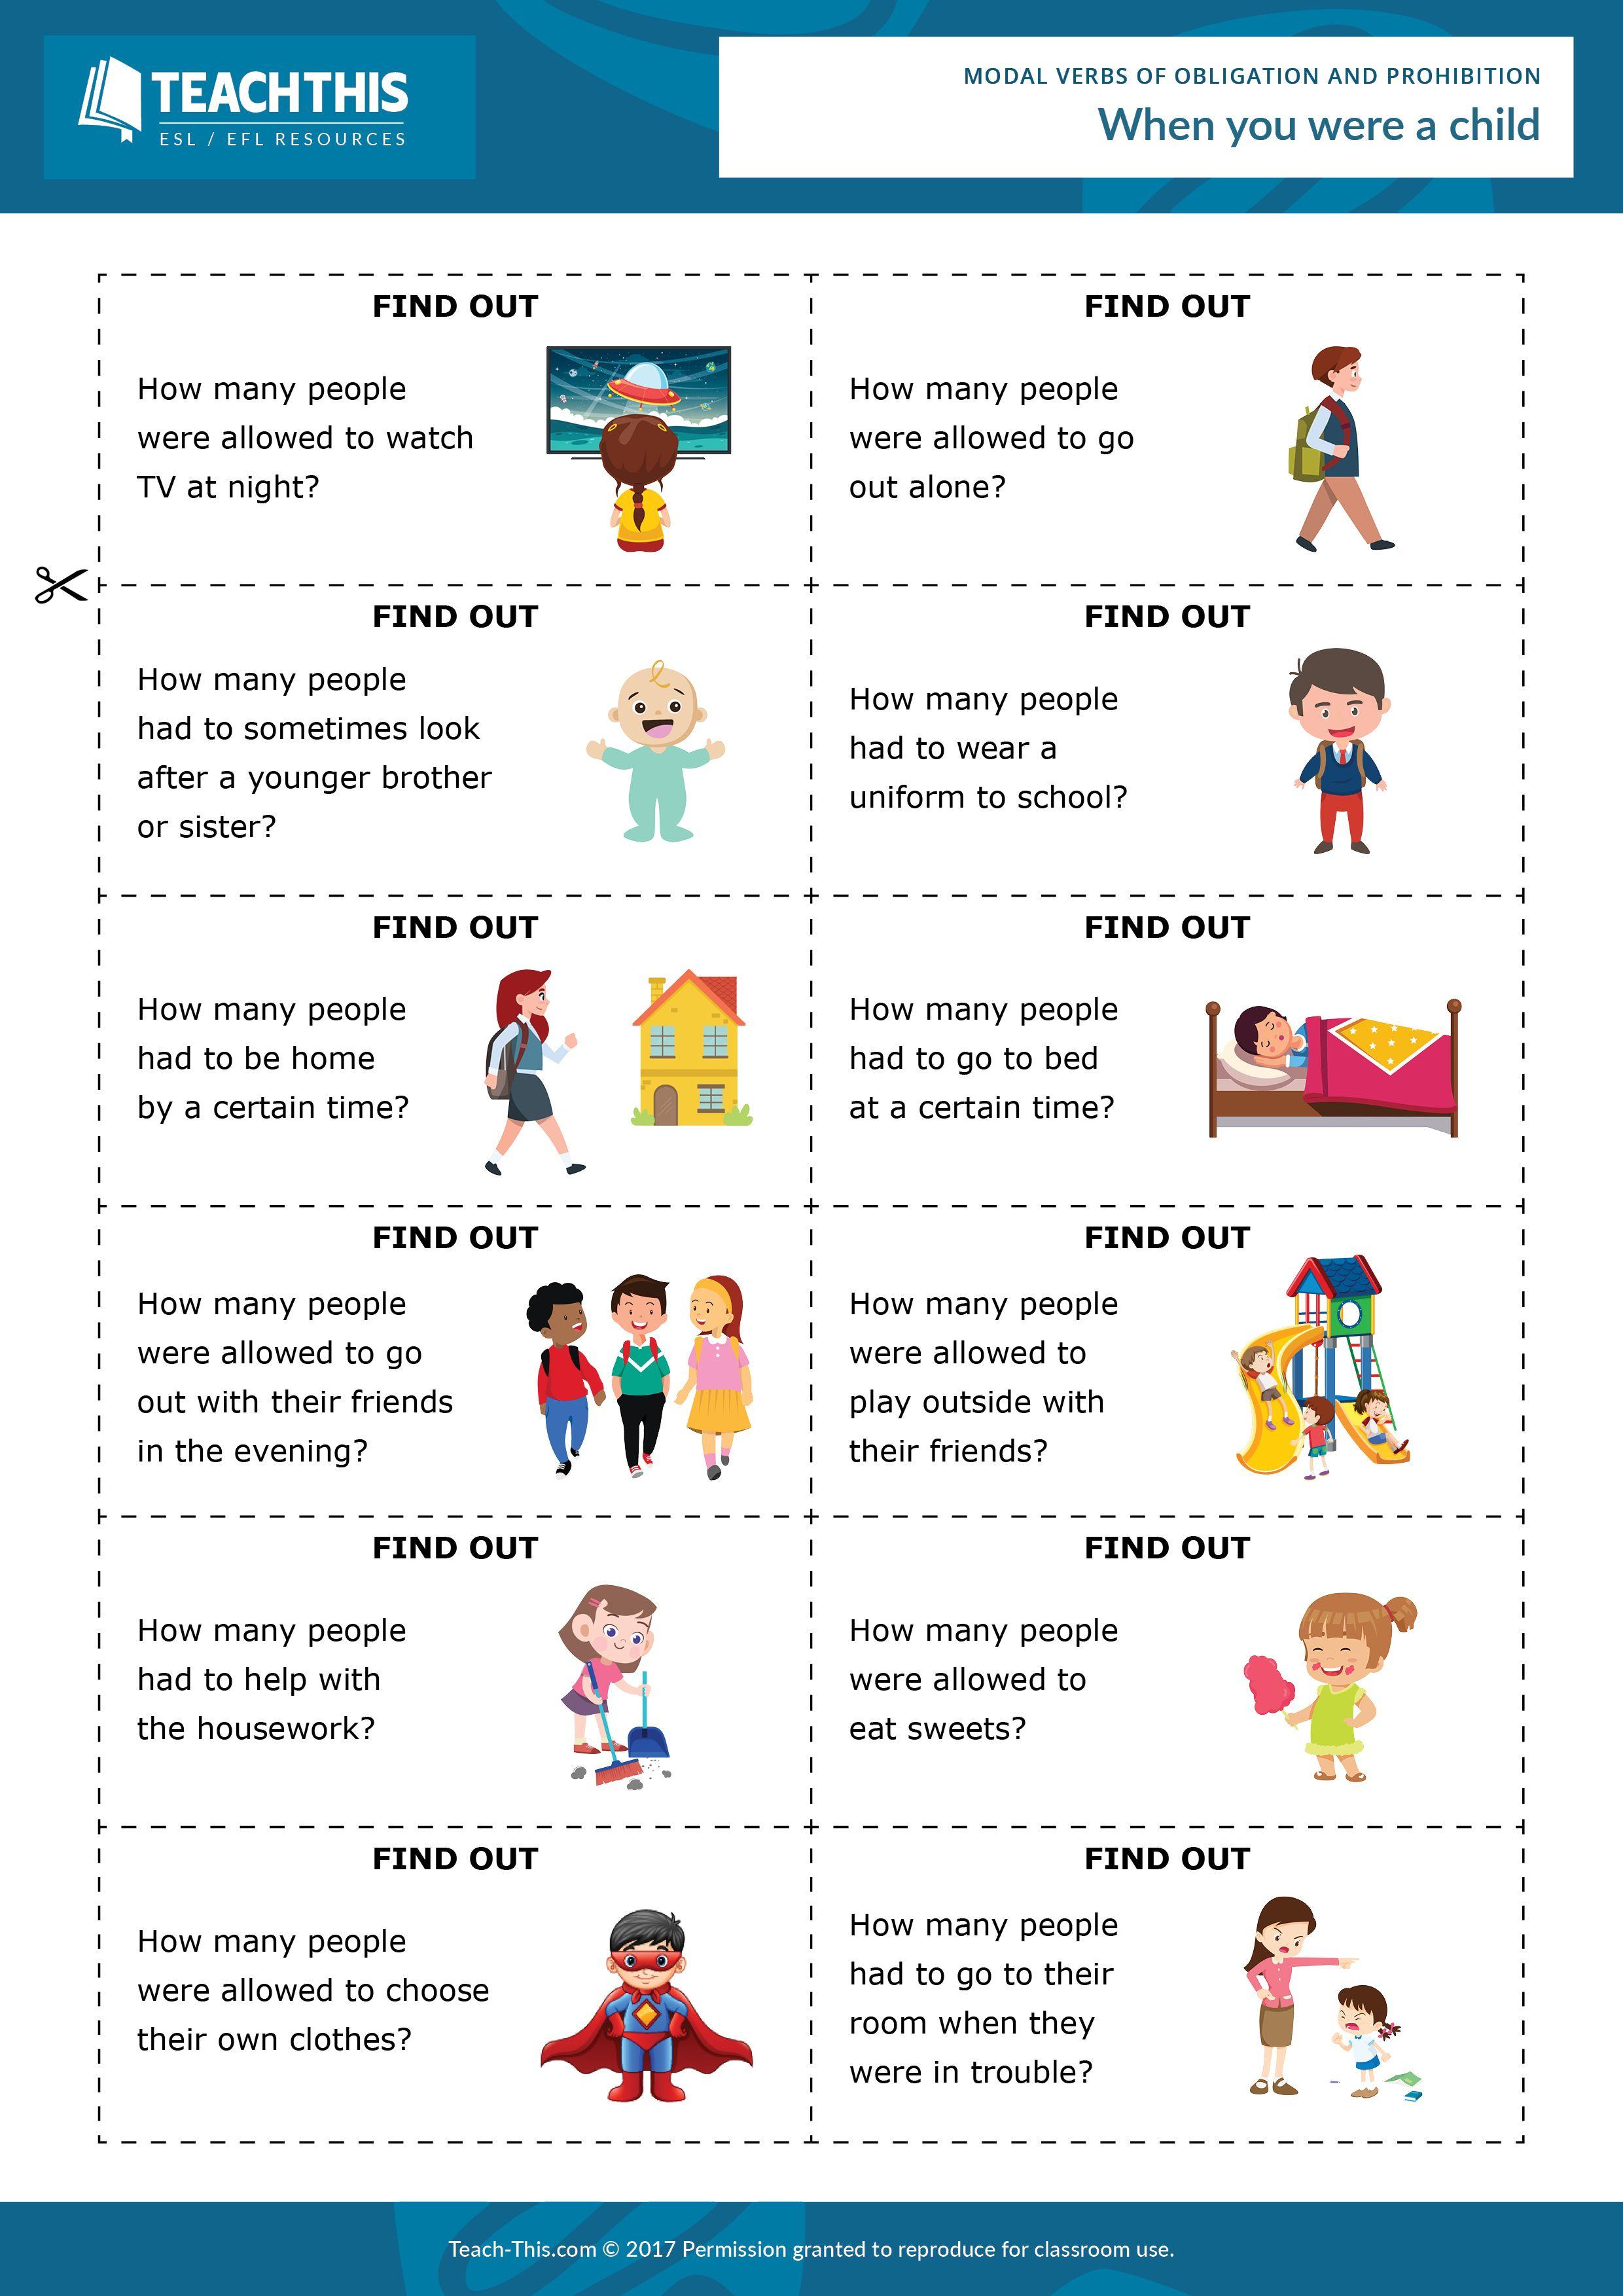 Knowledge speech writing help teacher english